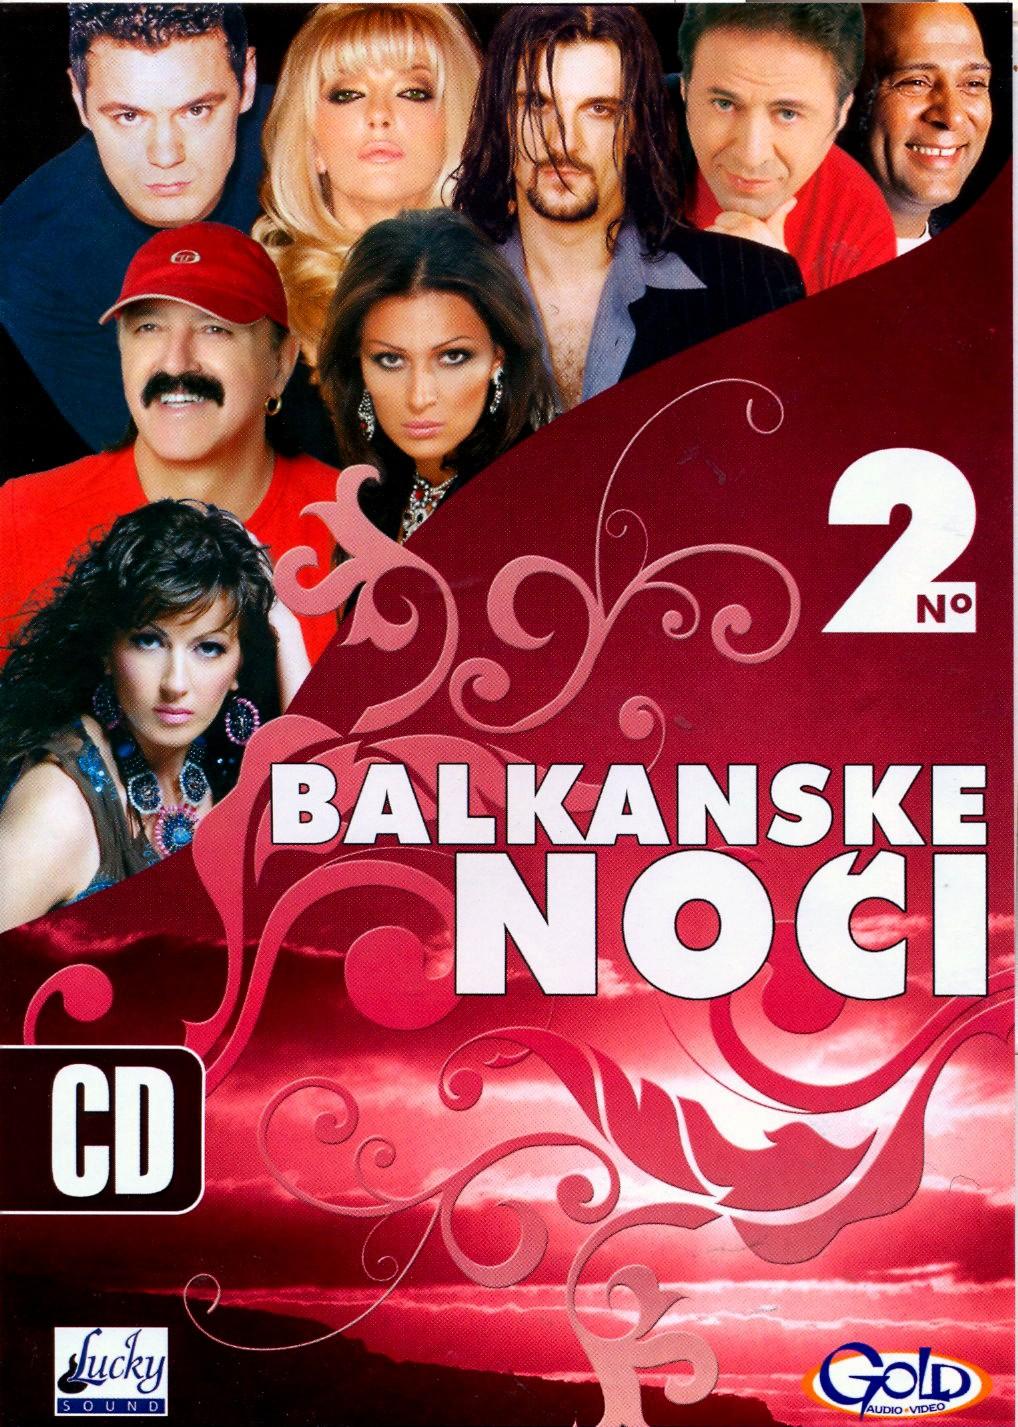 balkanske 2008 2 a